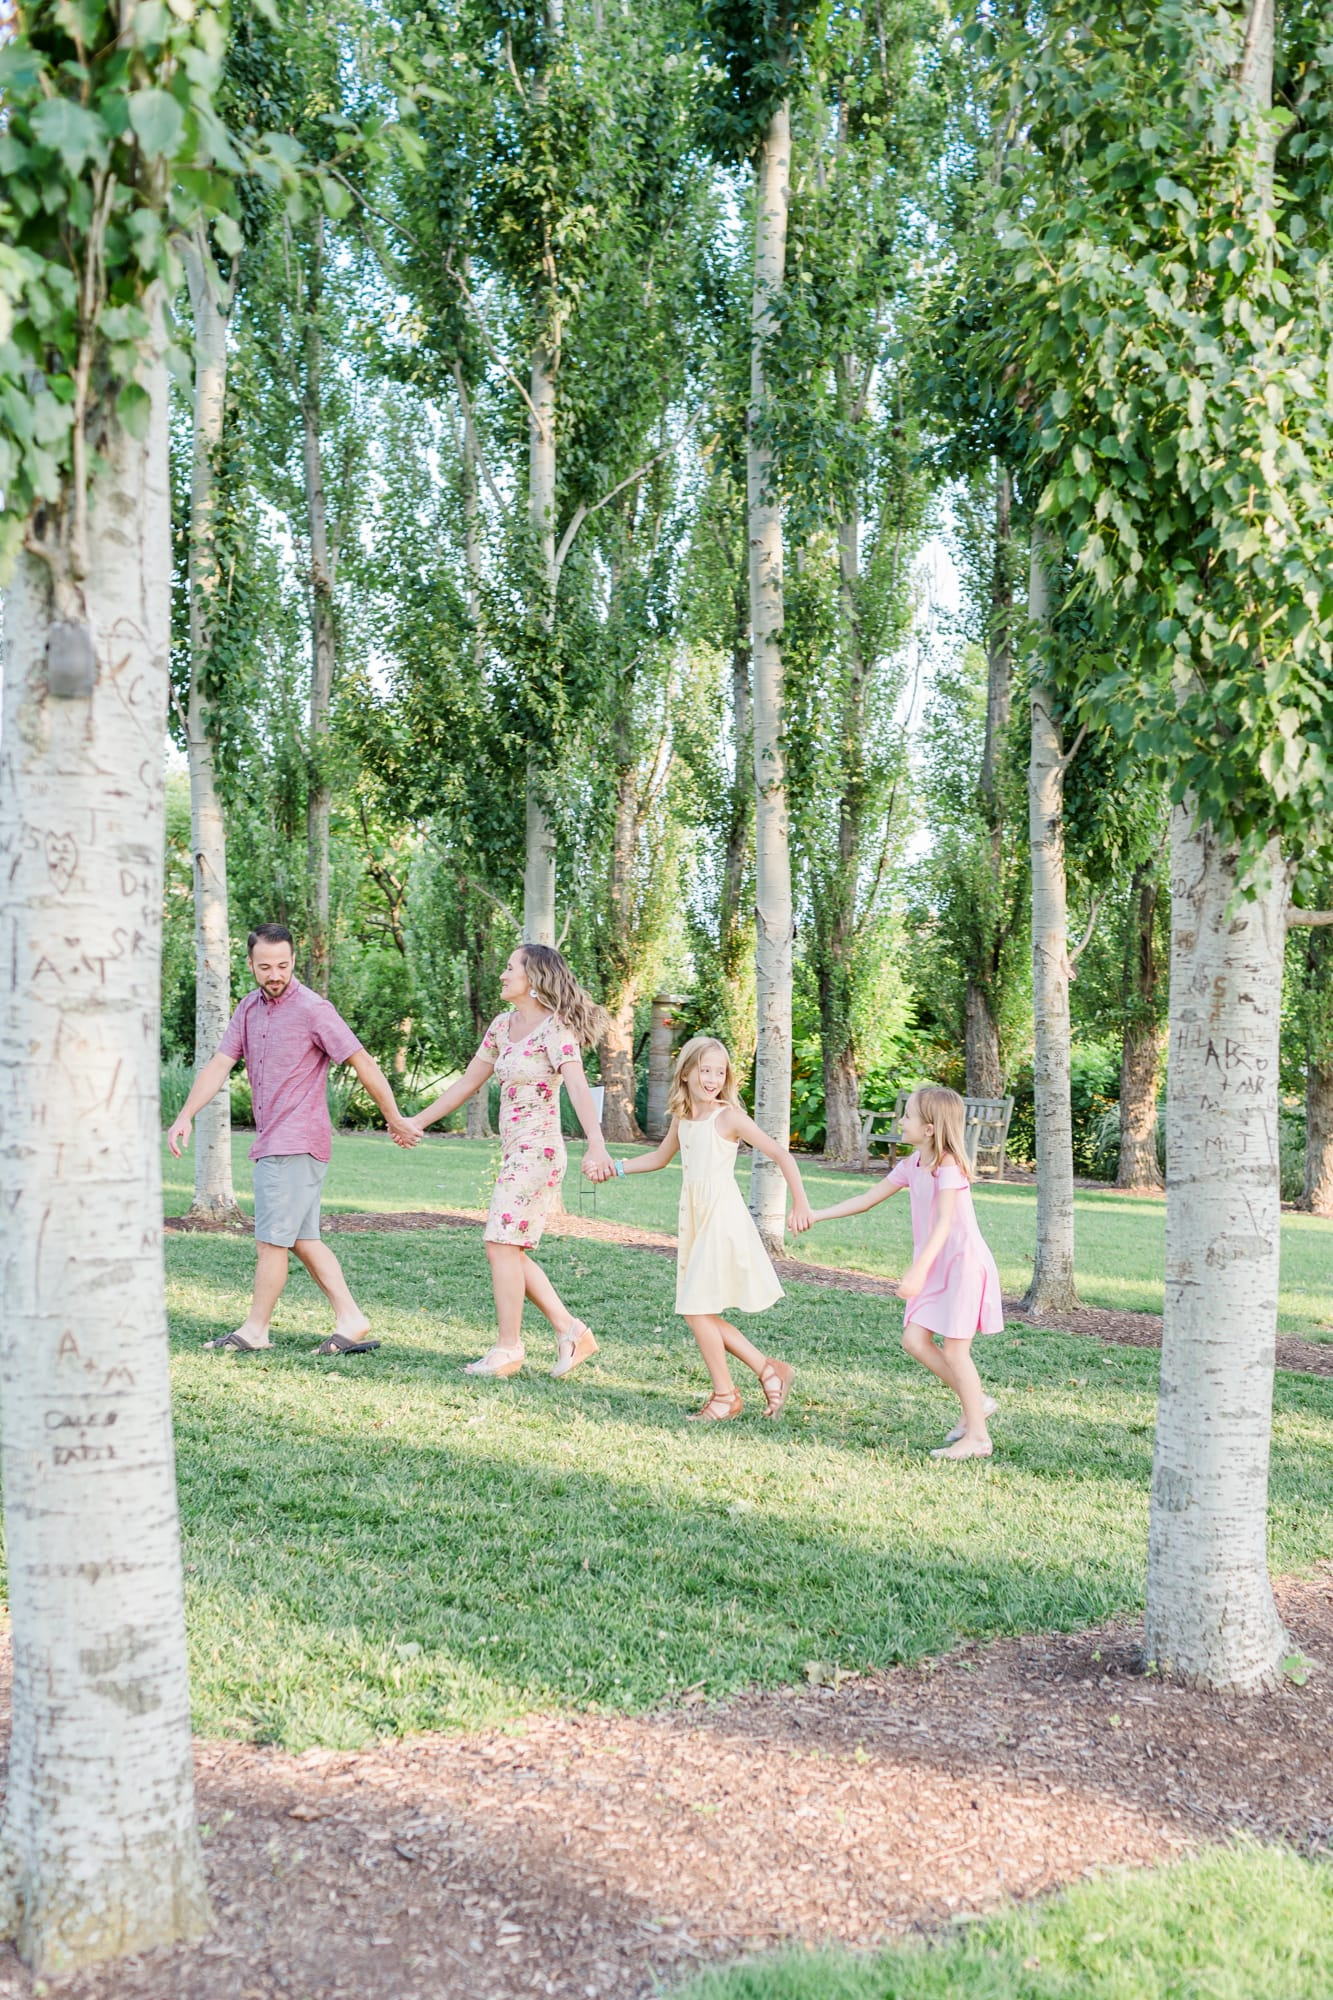 Family portraits at Penn State arboretum